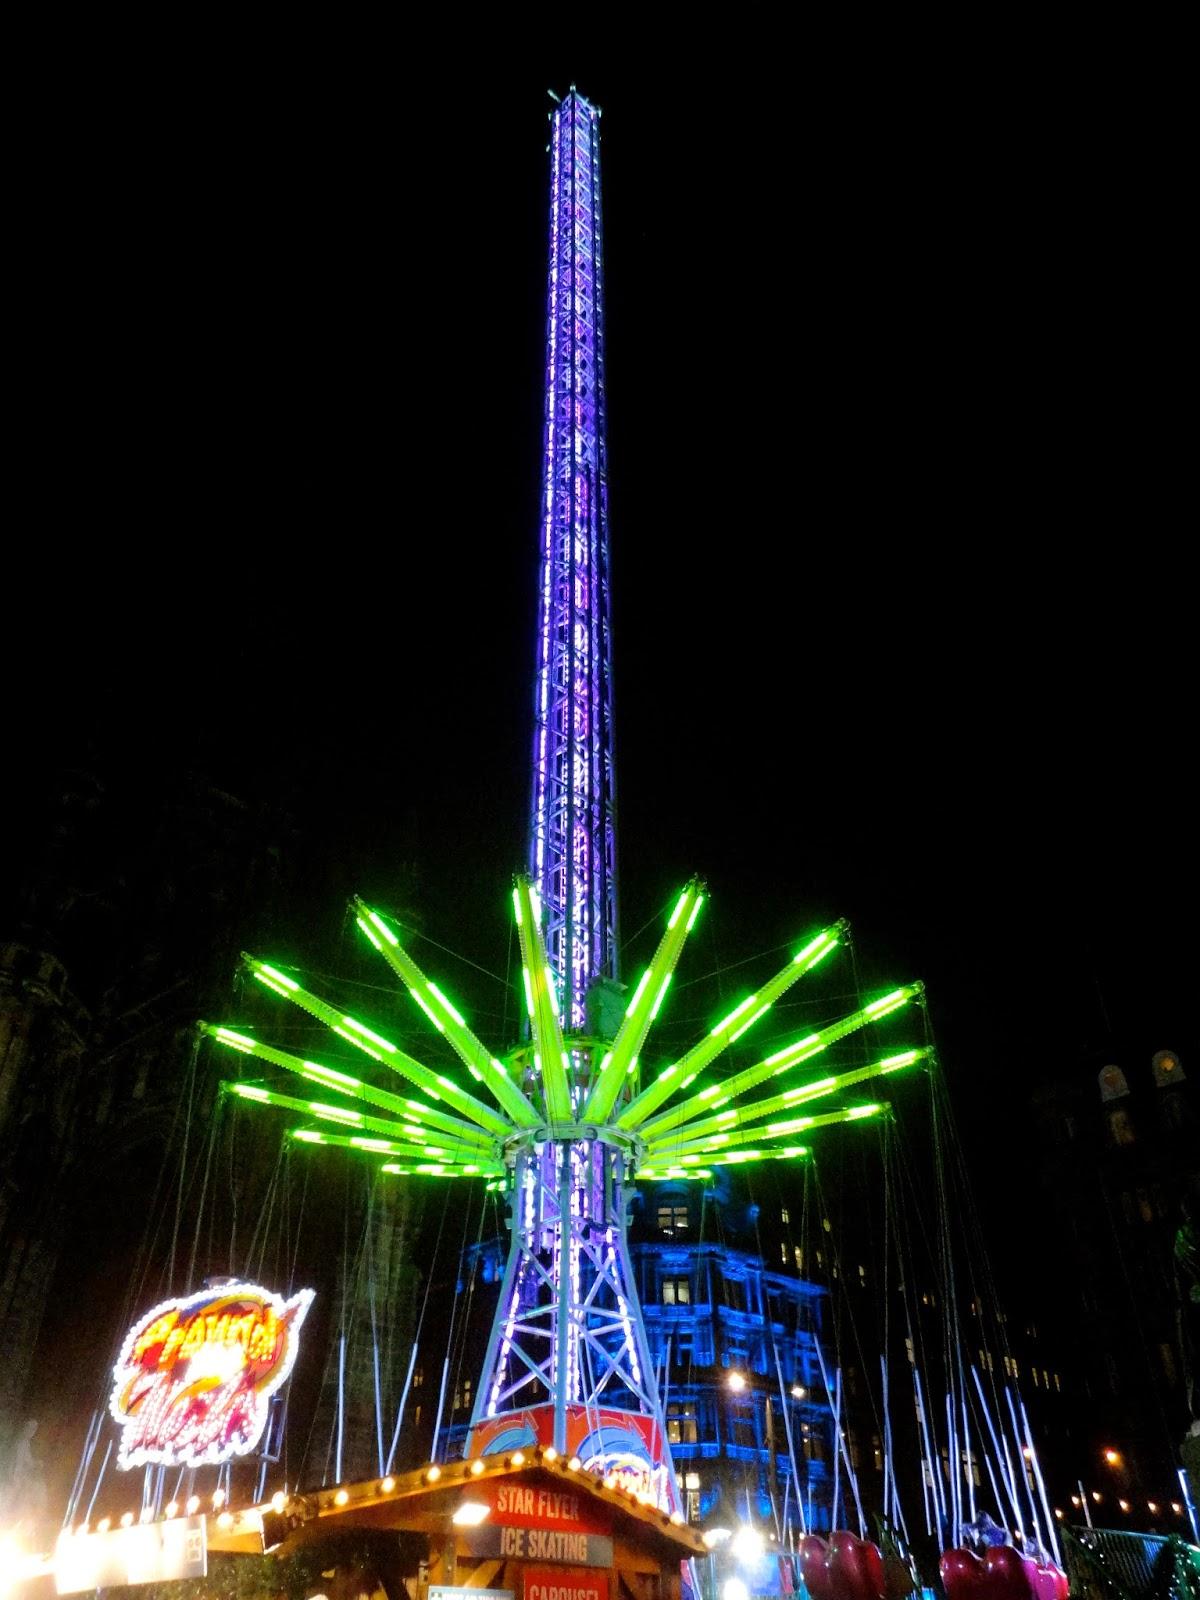 Giant tower of spinning swings in Edinburghu0027s Winter Wonderland at Christmas in Princes Street Gardens & Edinburgh Winter Wonderland | Just Muddling Through Life